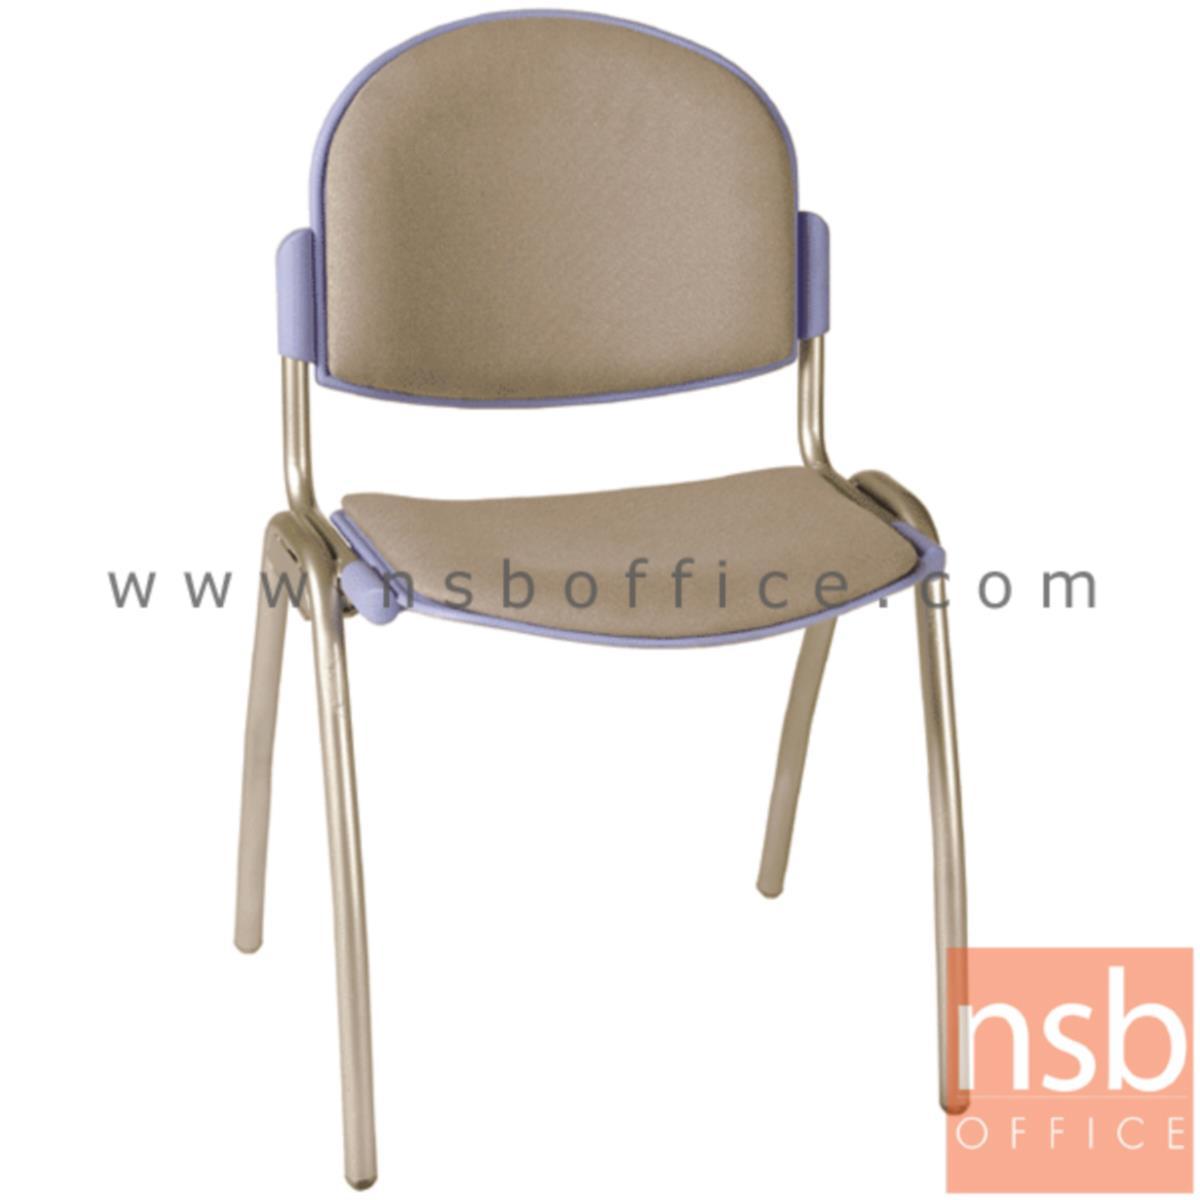 B05A063:เก้าอี้อเนกประสงค์เฟรมโพลี่ รุ่น A056-446  ขาเหล็ก